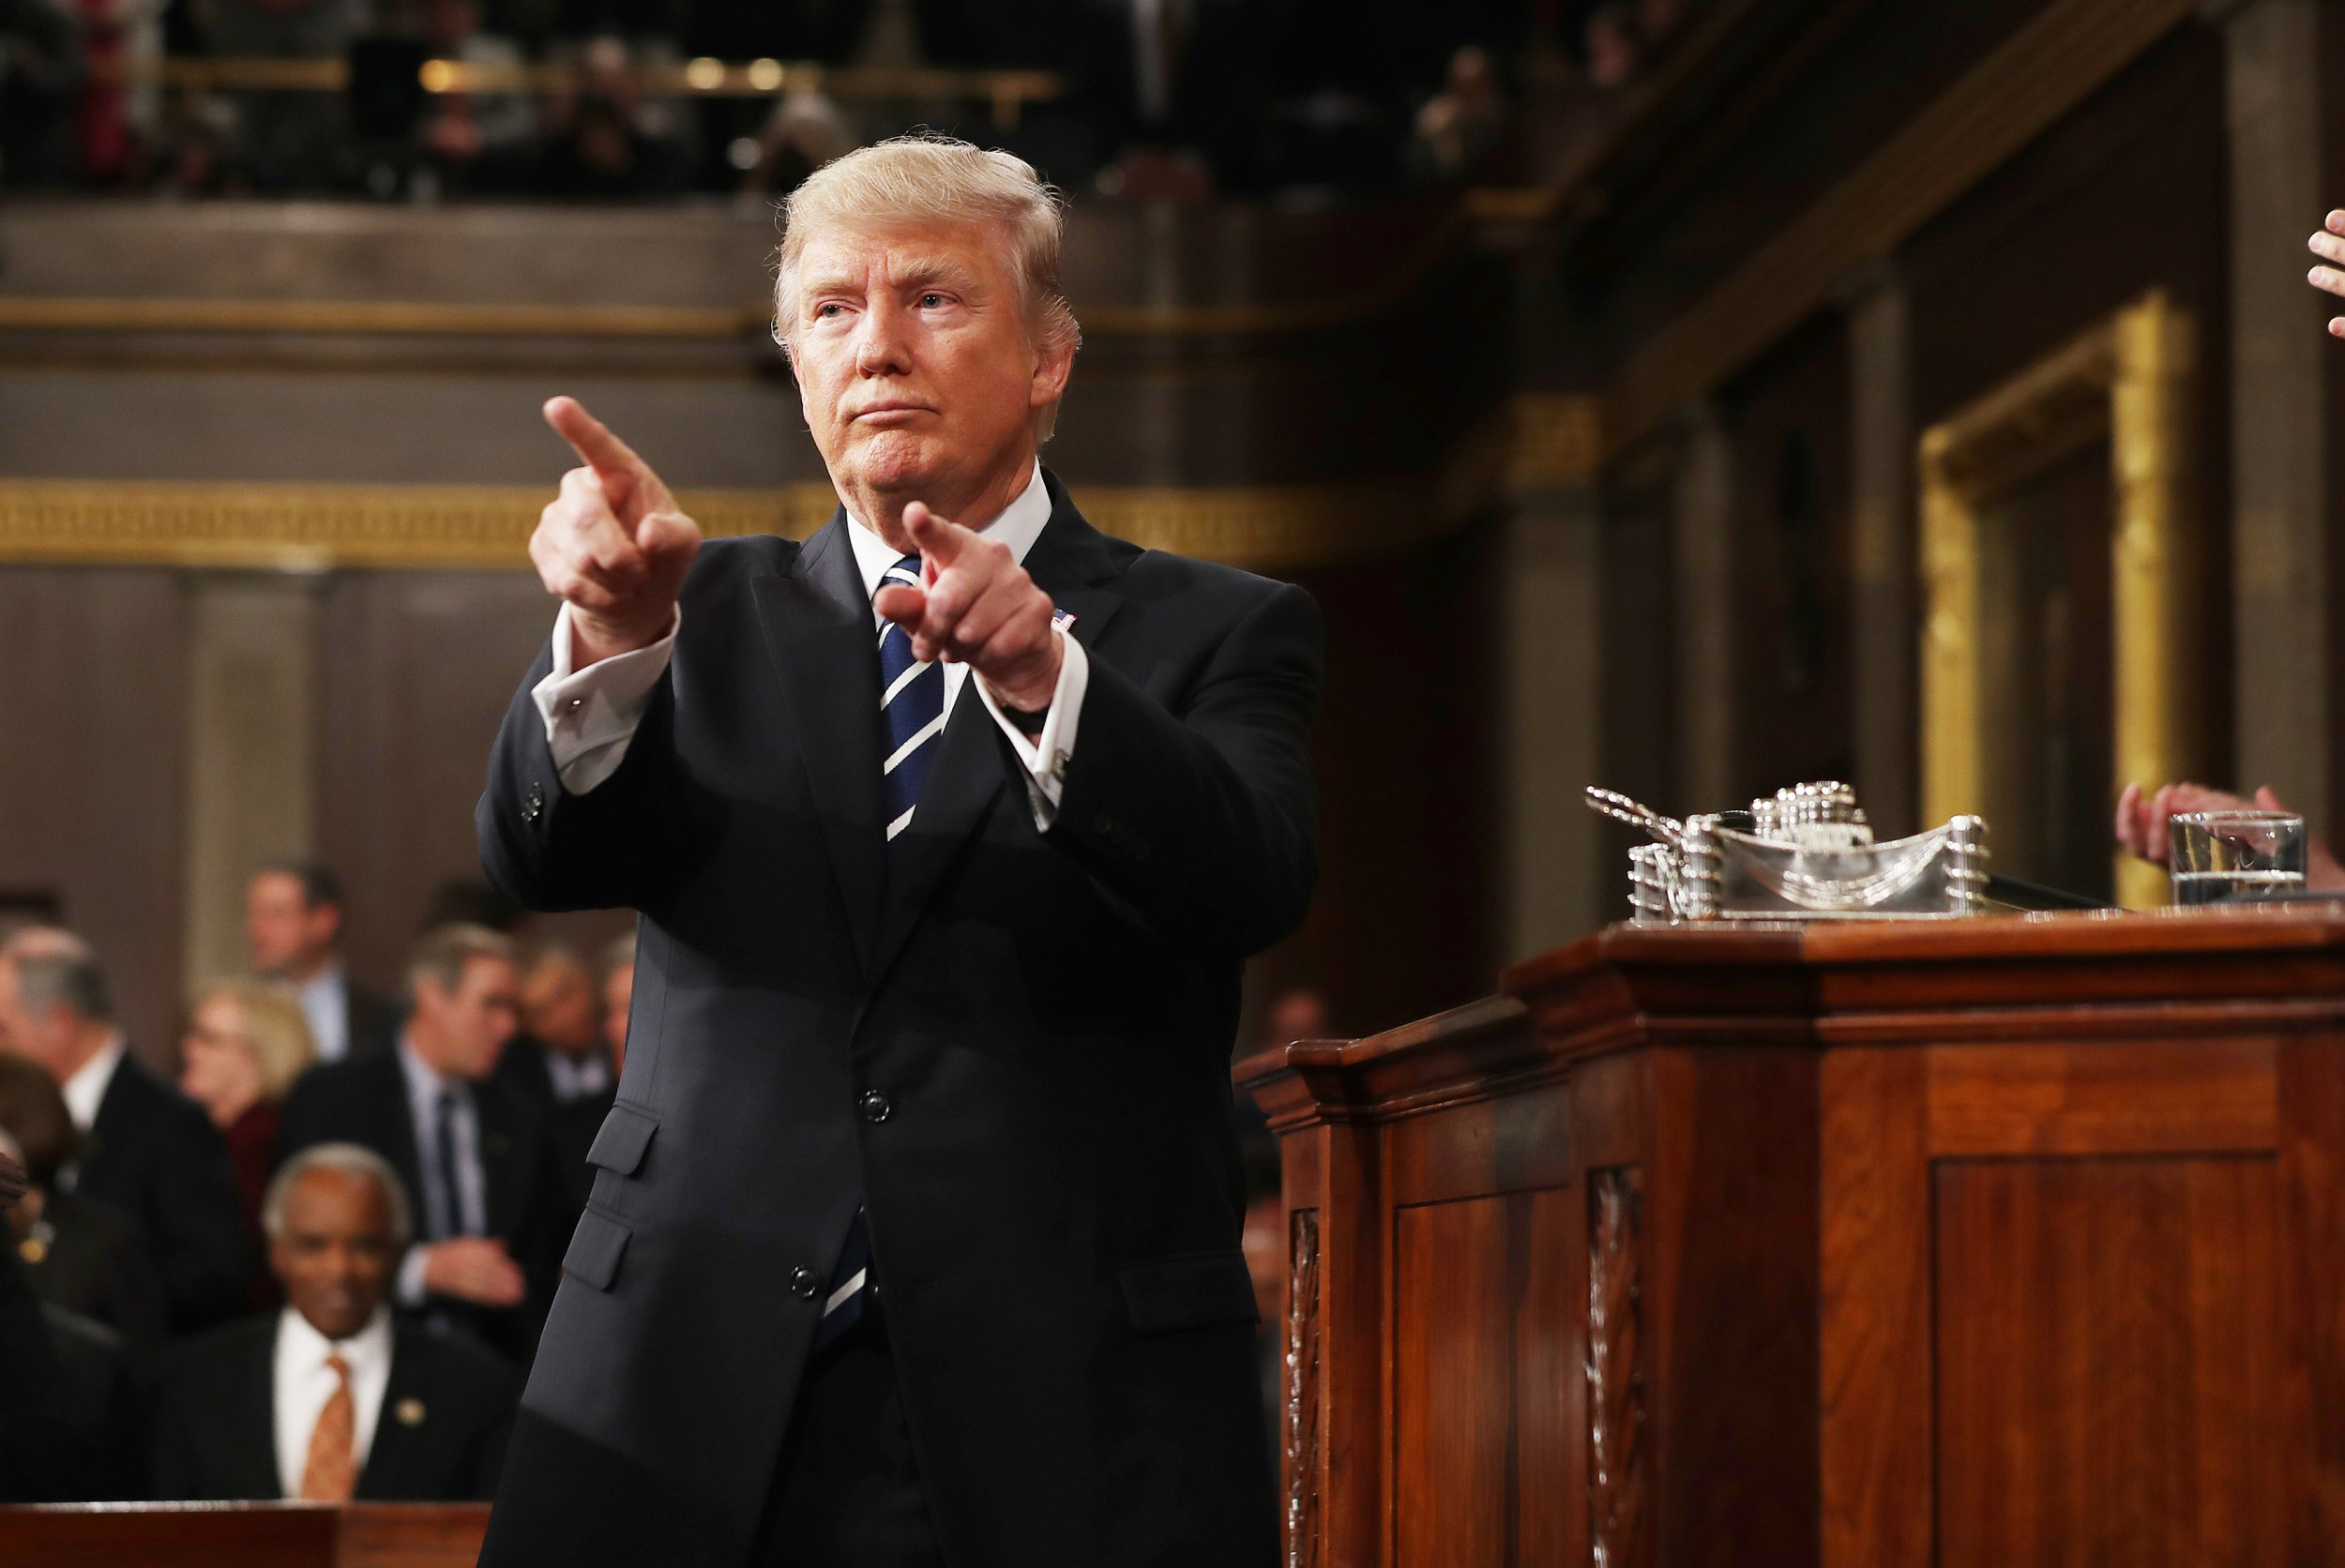 228_Trump address